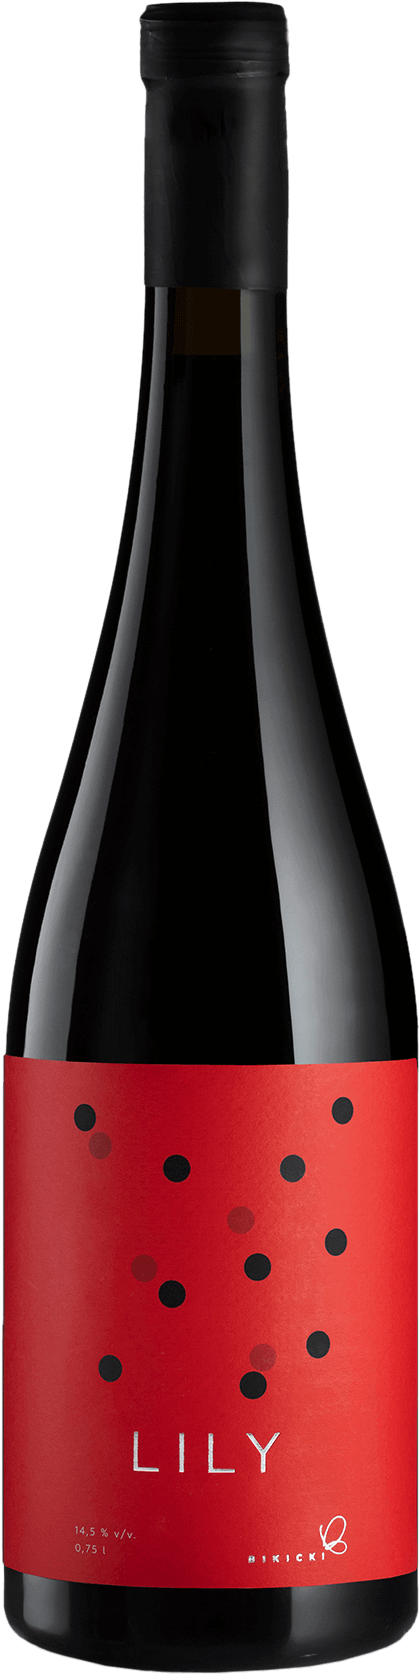 Lily Merlot vino